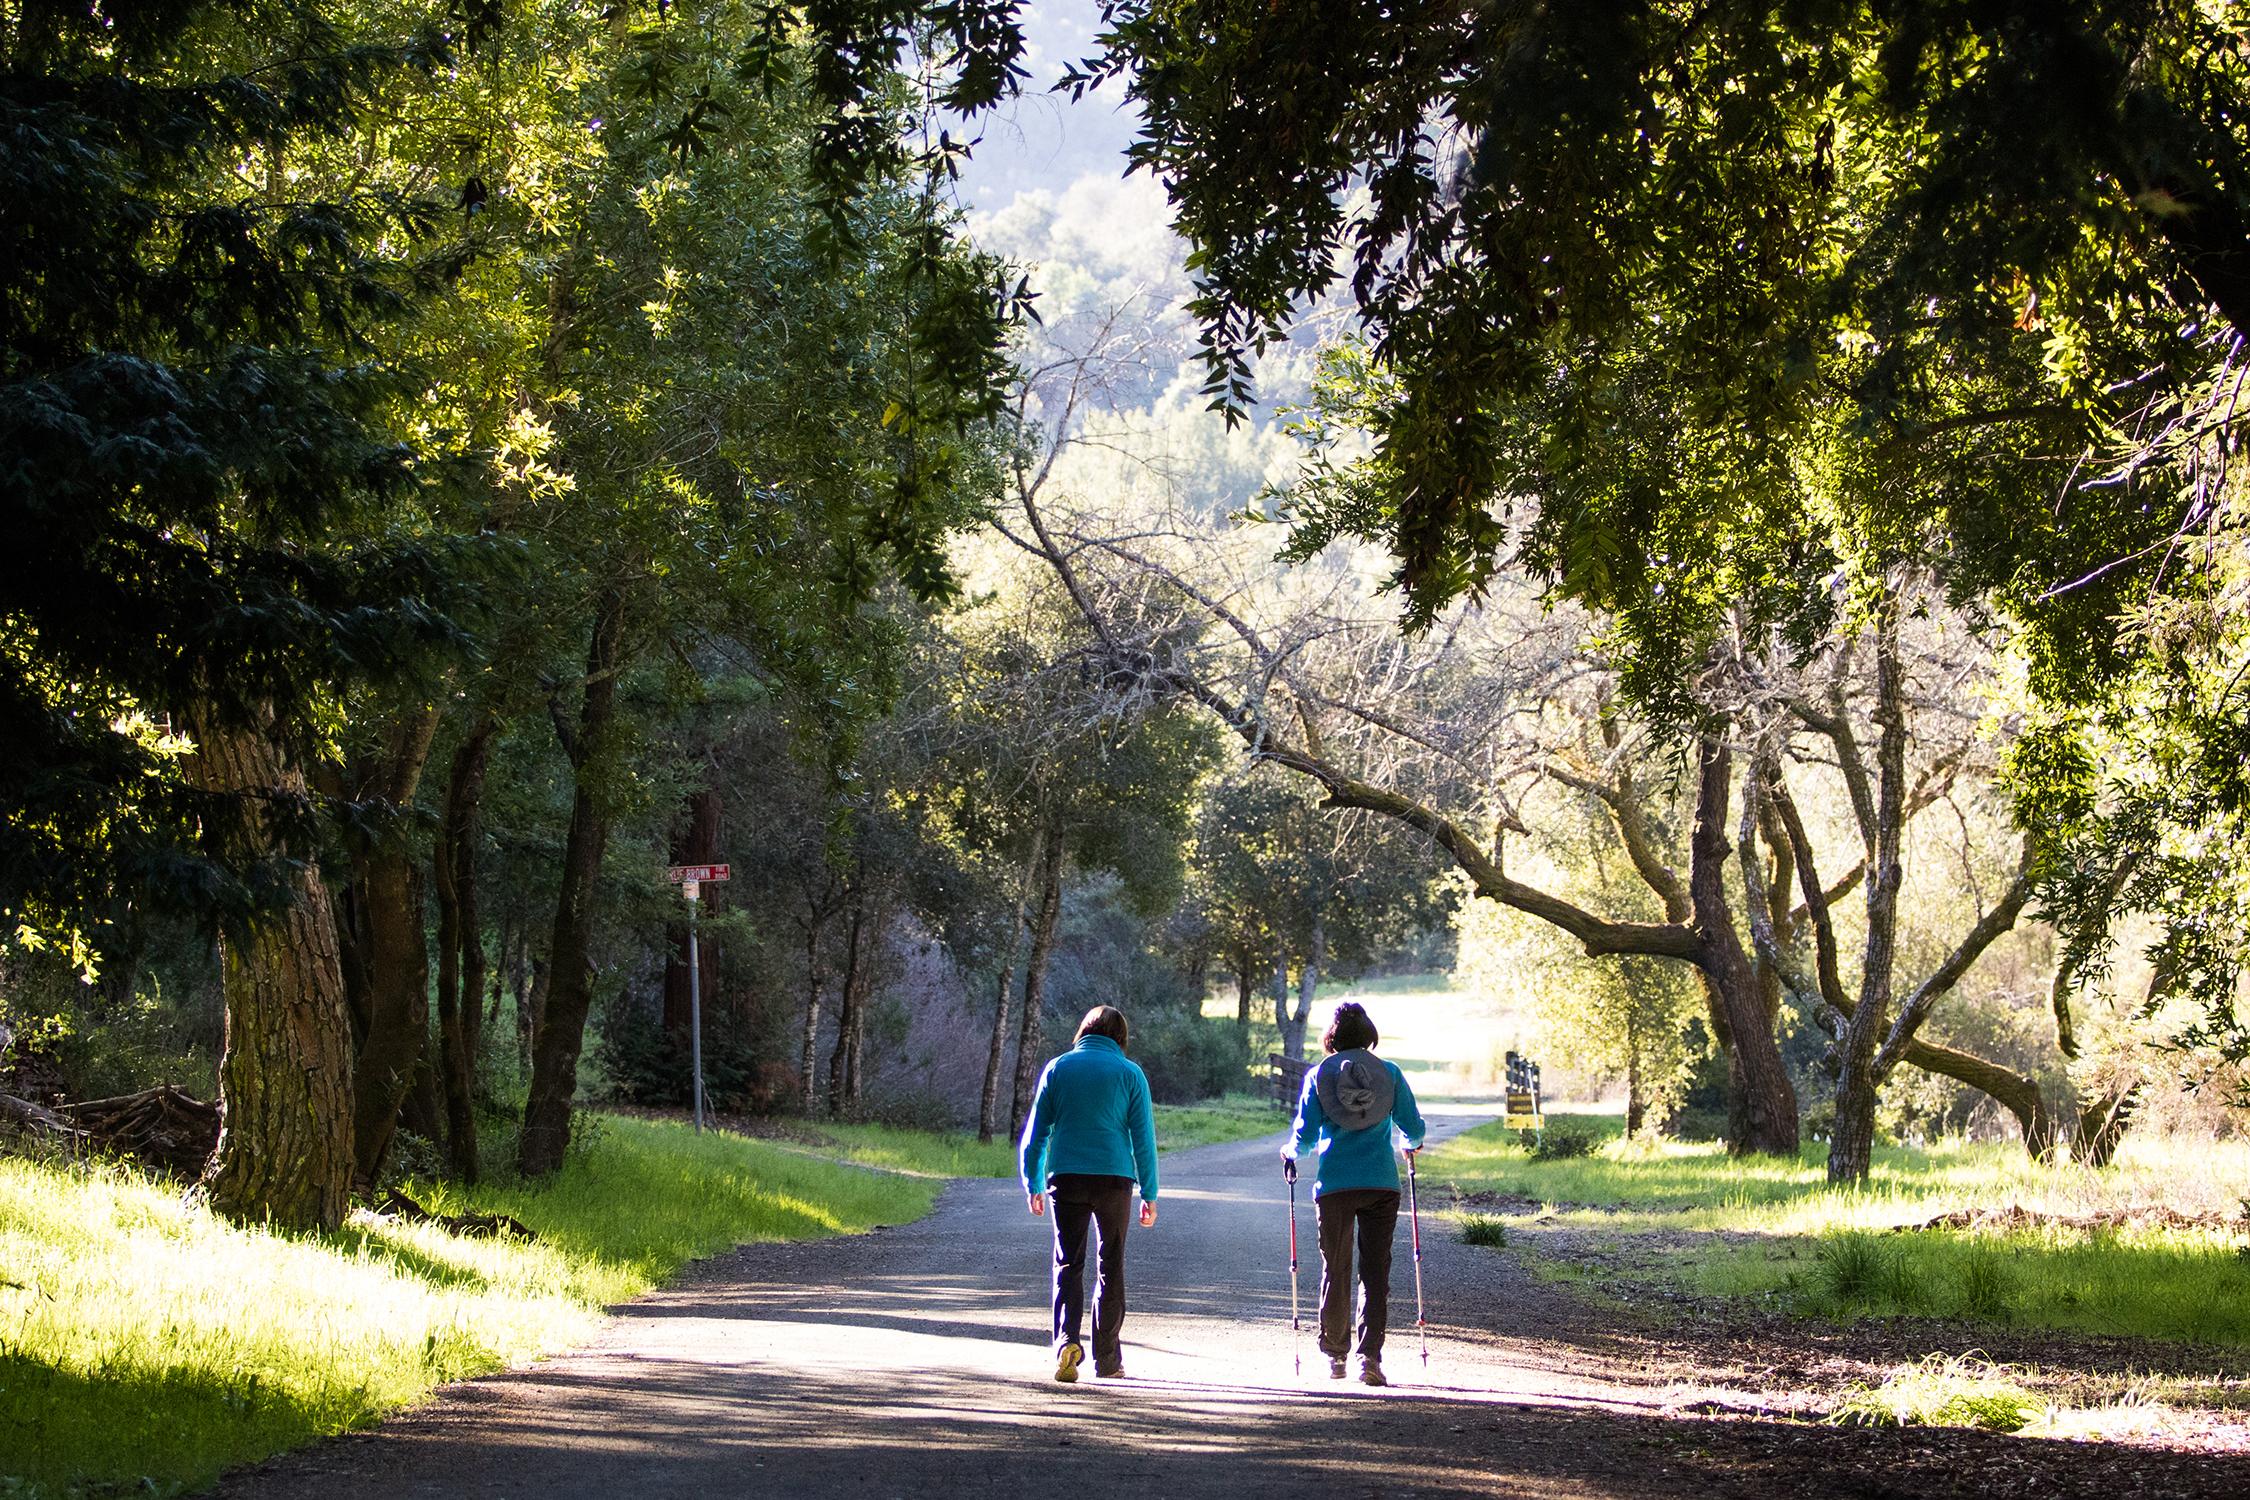 Hikers walk toward Wildhorse Valley in Foothills Park, the upstream area of Buckeye Creek.